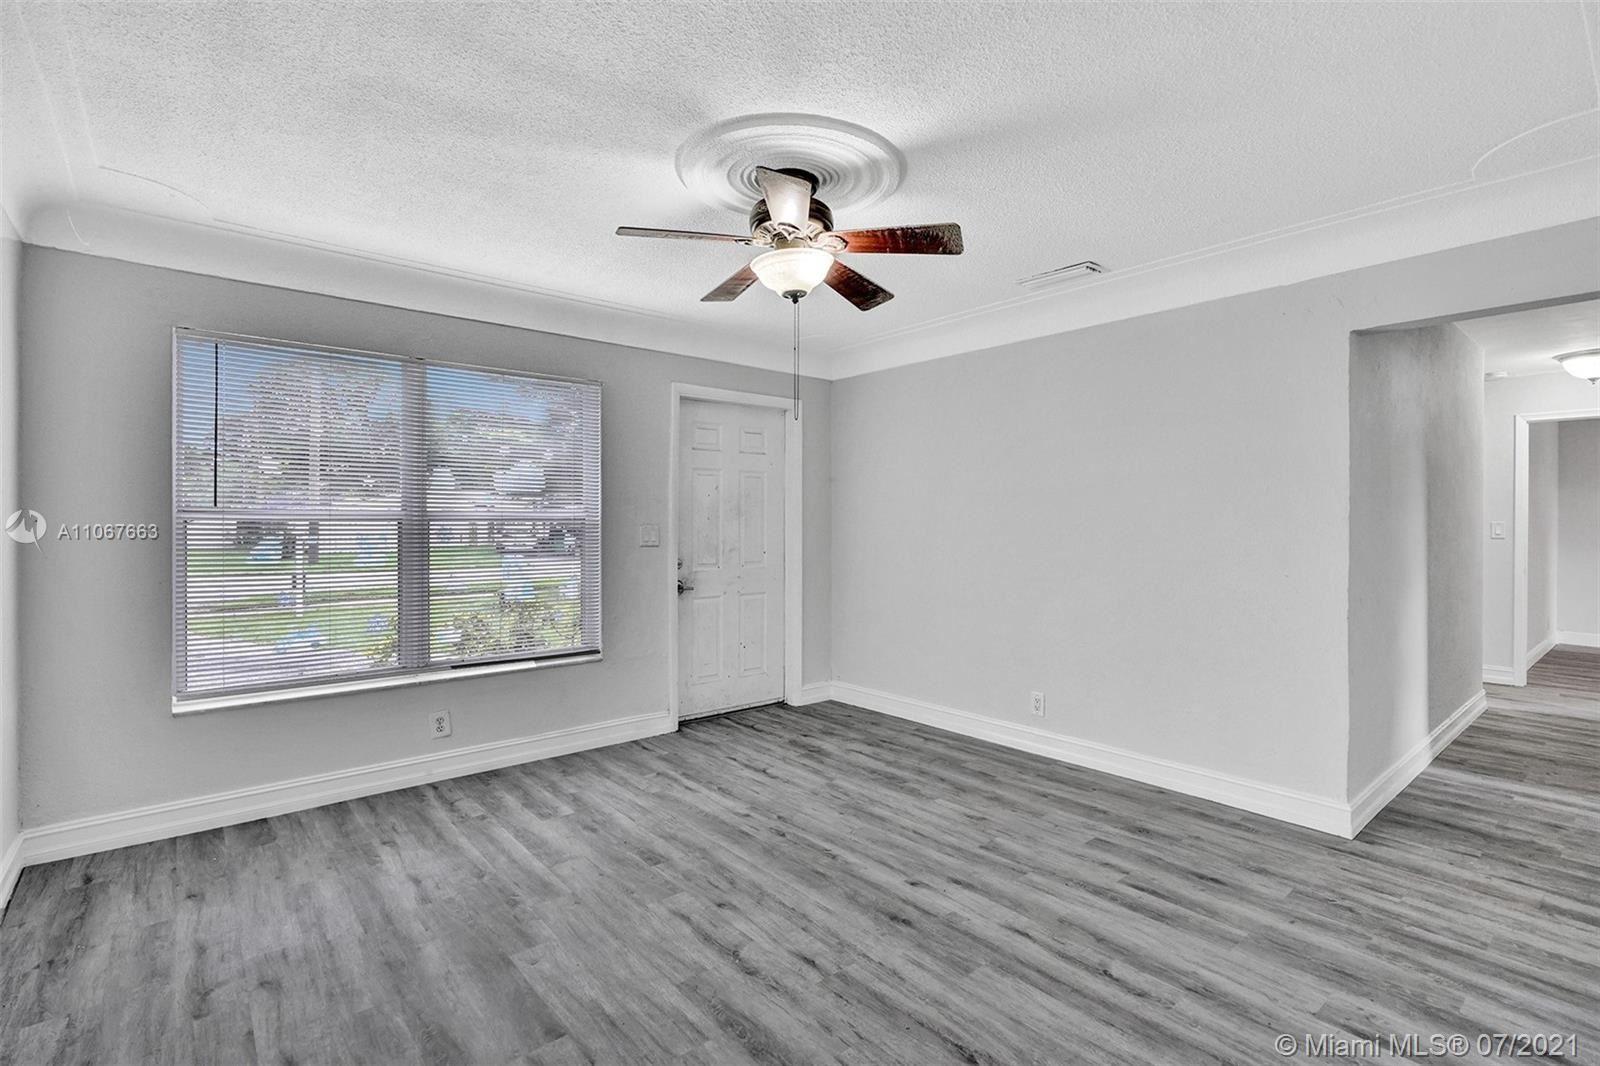 Photo of 6166 Winfield Blvd, Margate, FL 33063 (MLS # A11067663)